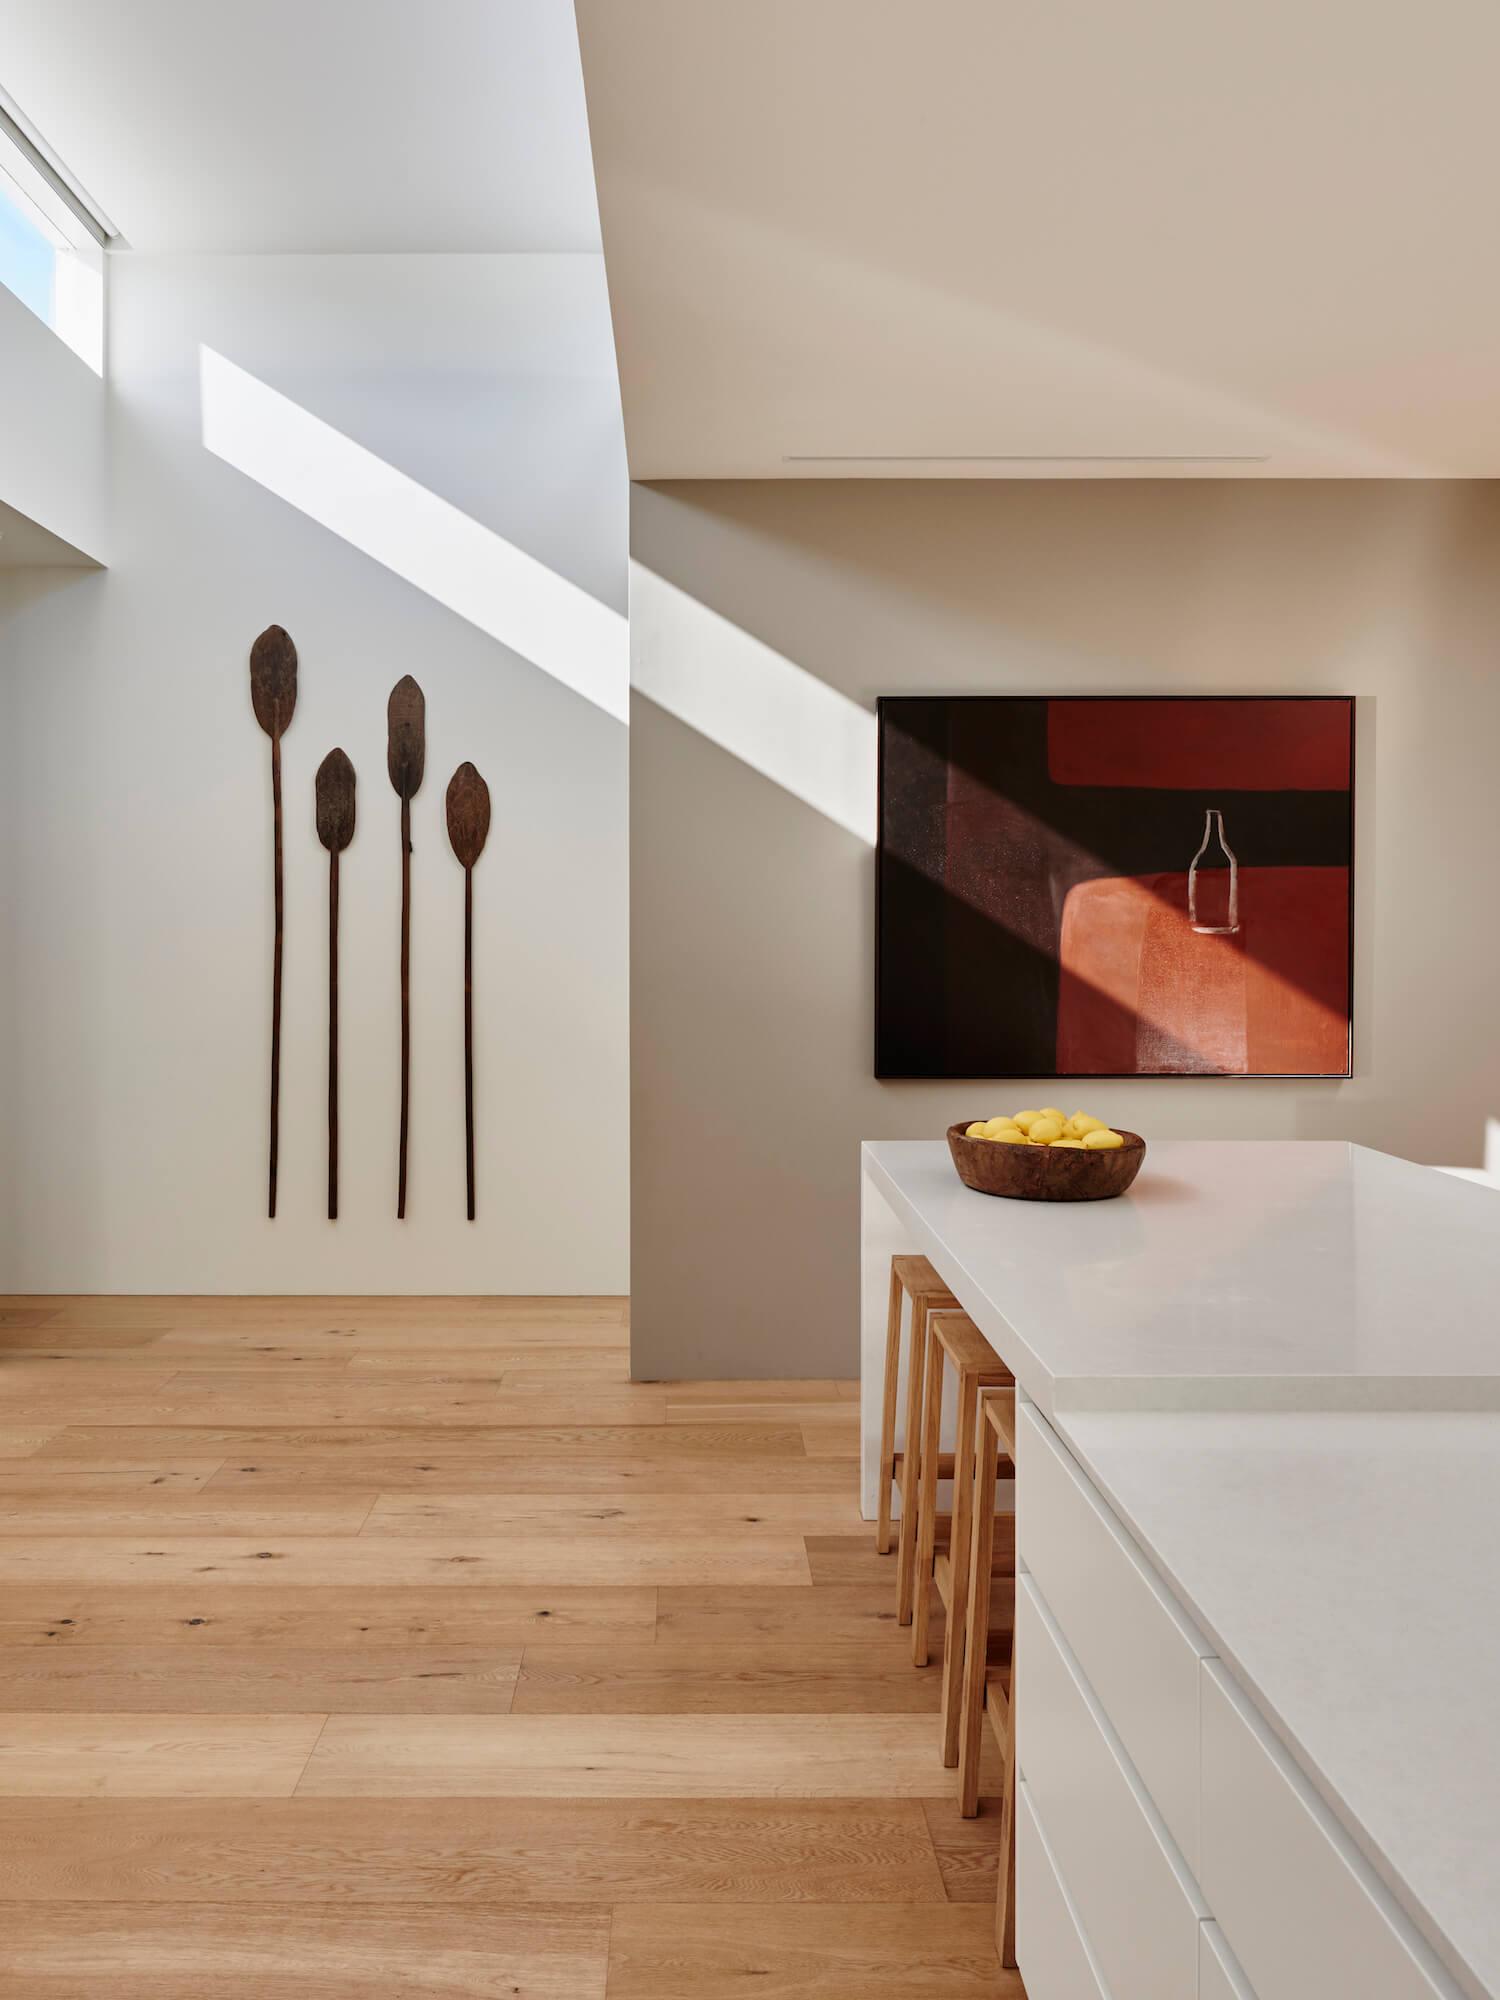 est living duffy st portsea beach house kate beadle interior design 8